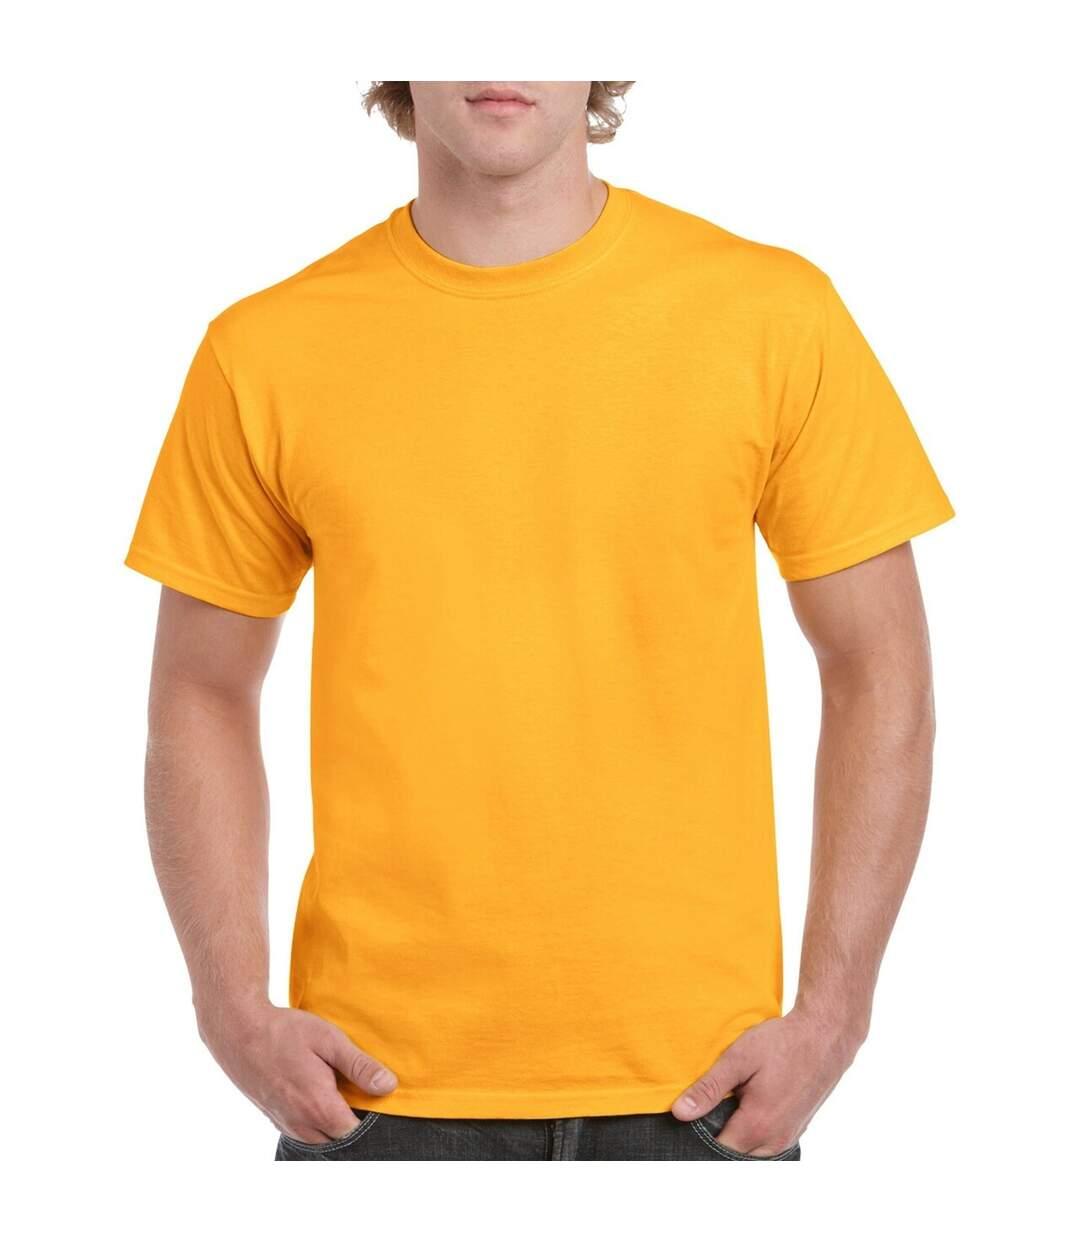 Gildan Mens Heavy Cotton Short Sleeve T-Shirt (Pack Of 5) (Cornsilk) - UTBC4807